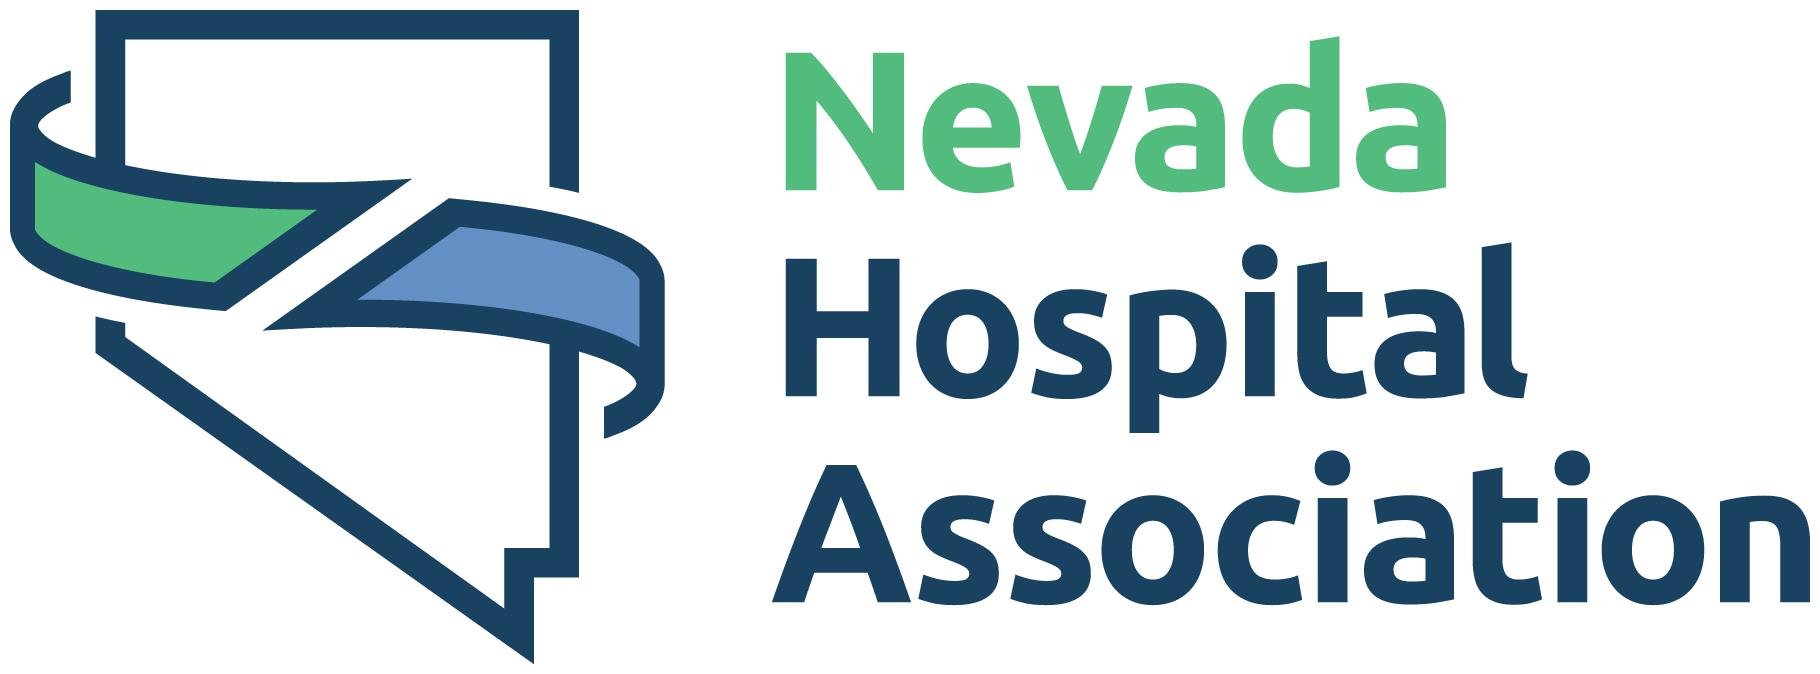 Nevada Hospital Association